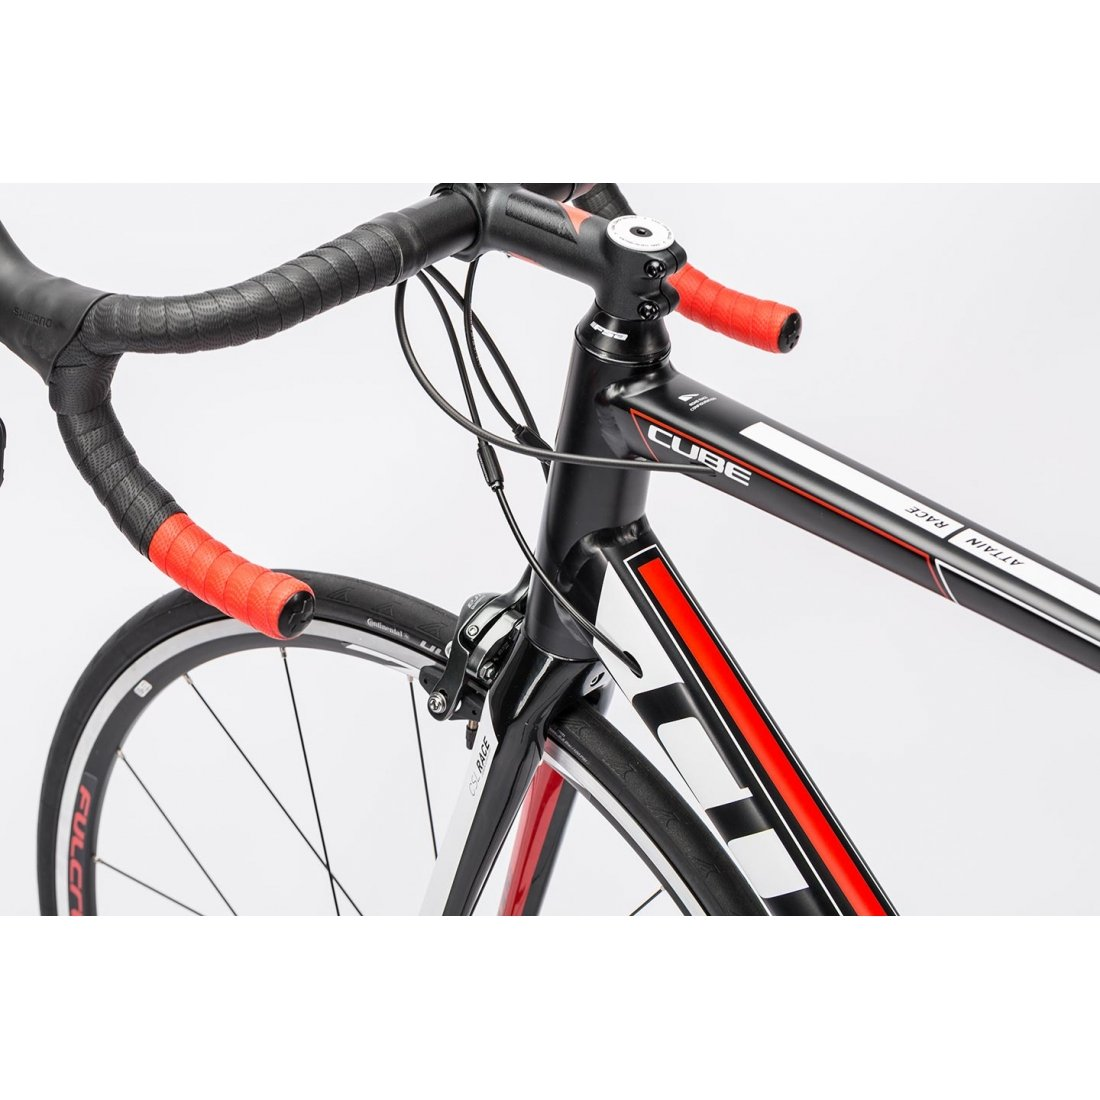 Bicicleta de carretera Cube Attain Race 2016 – H 56 cms: Amazon.es ...